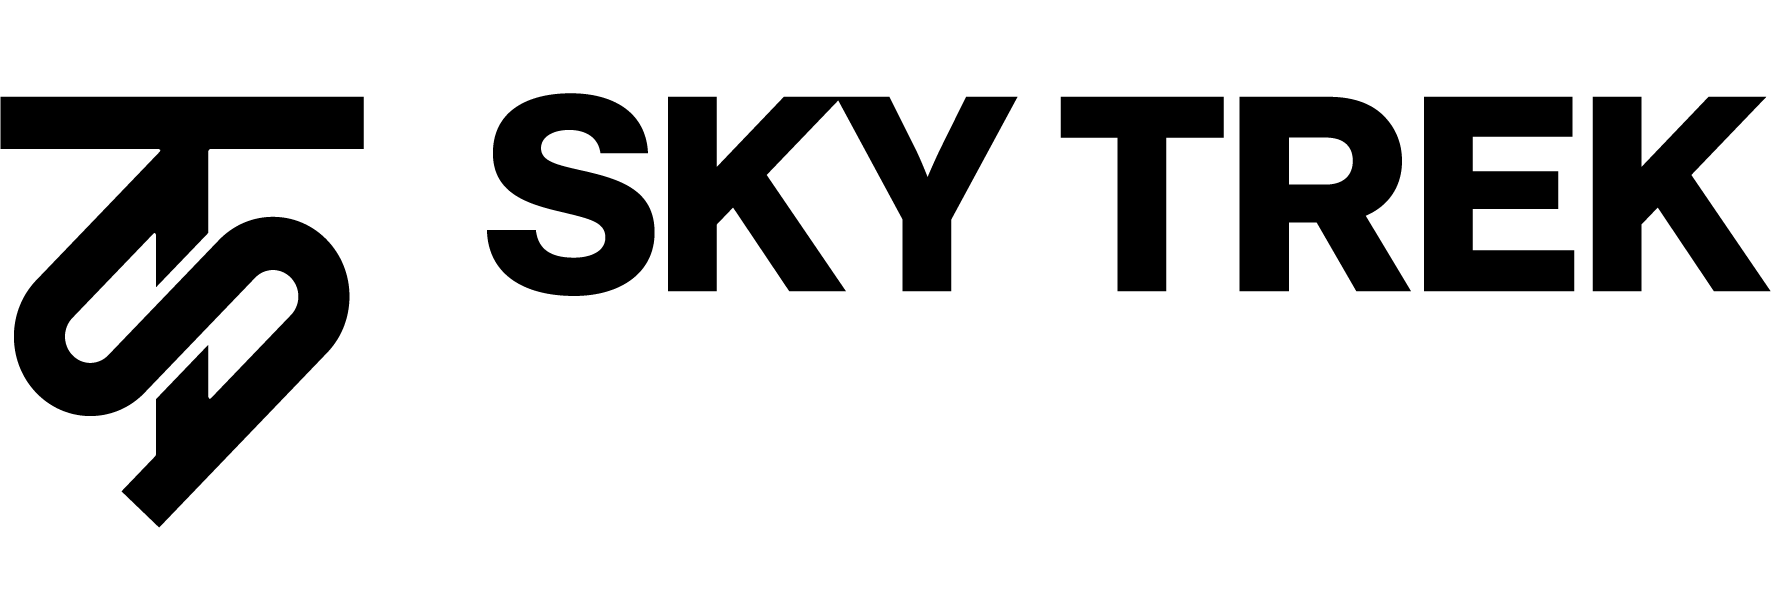 SKYTREK_Logo1